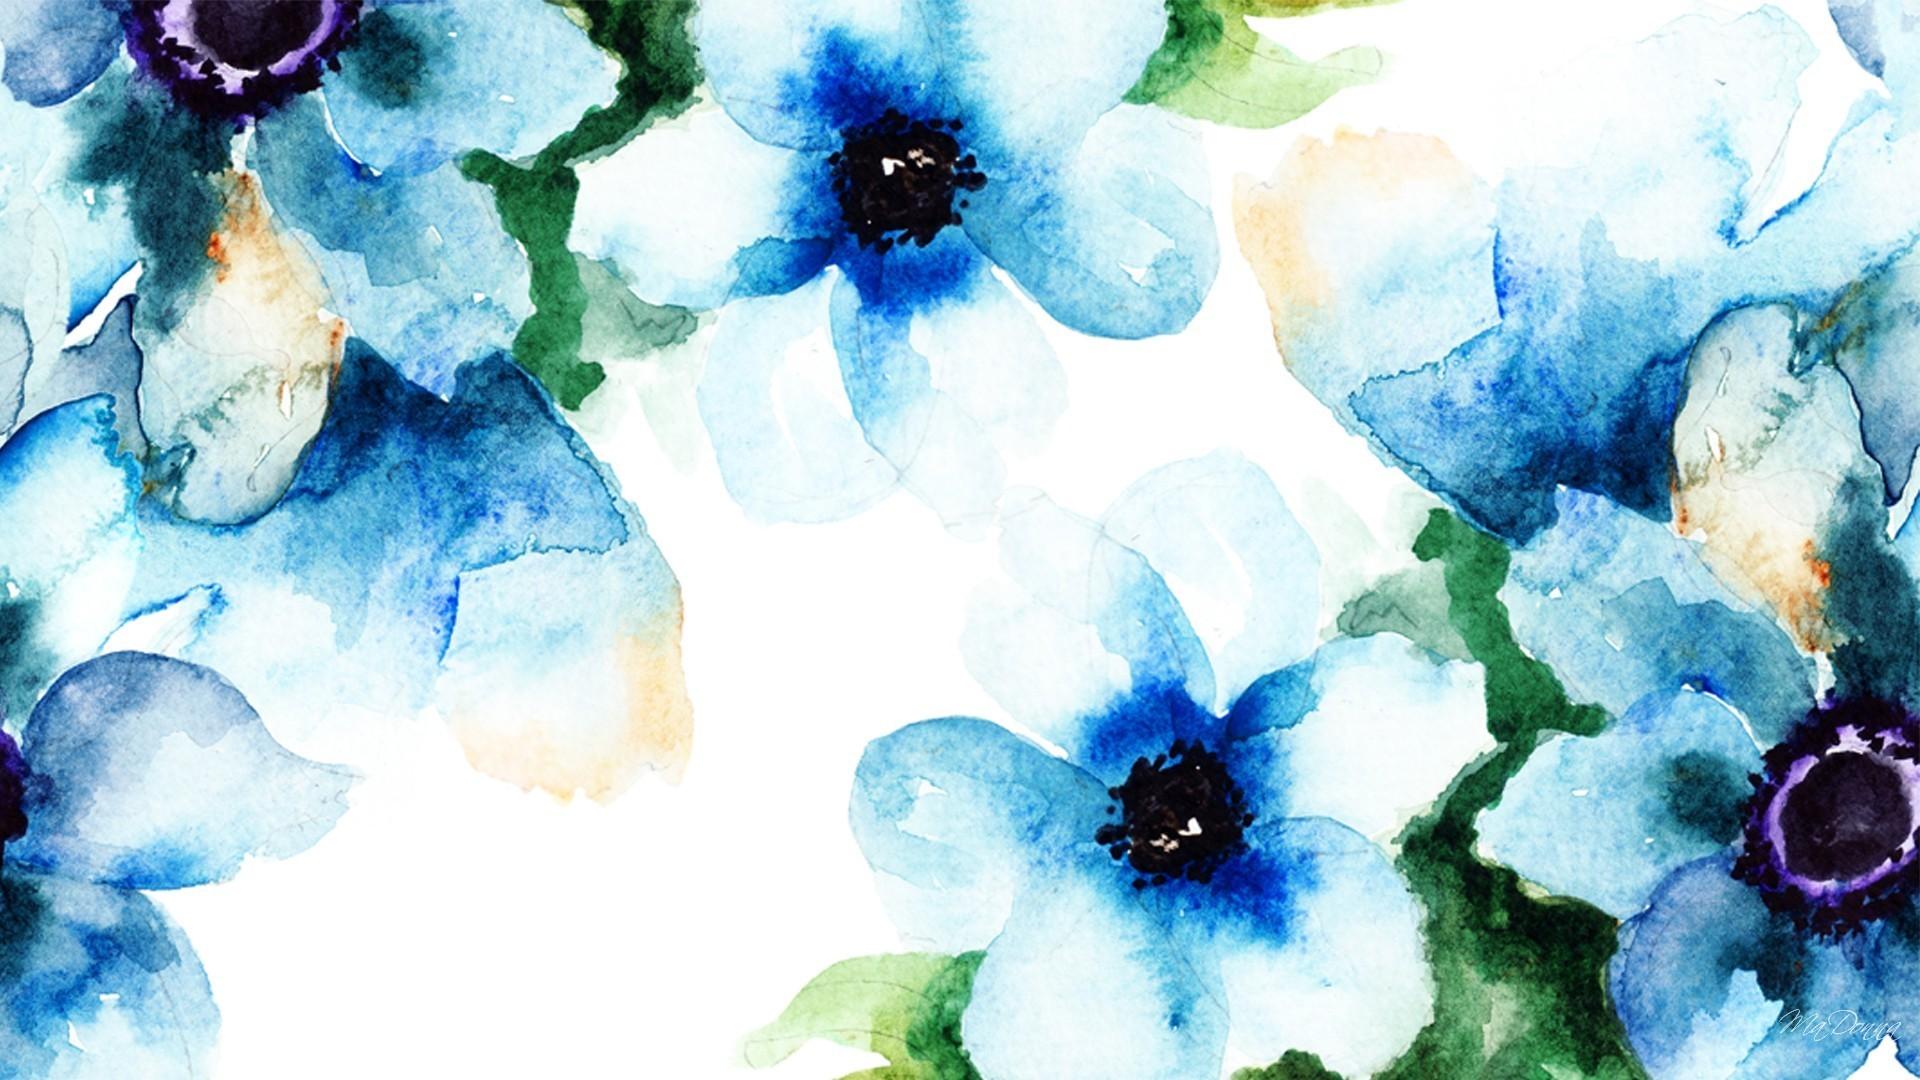 Free Desktop Hd Ipad Iphone Wallpapers: 40+ Watercolor Backgrounds ·① Download Free Cool HD